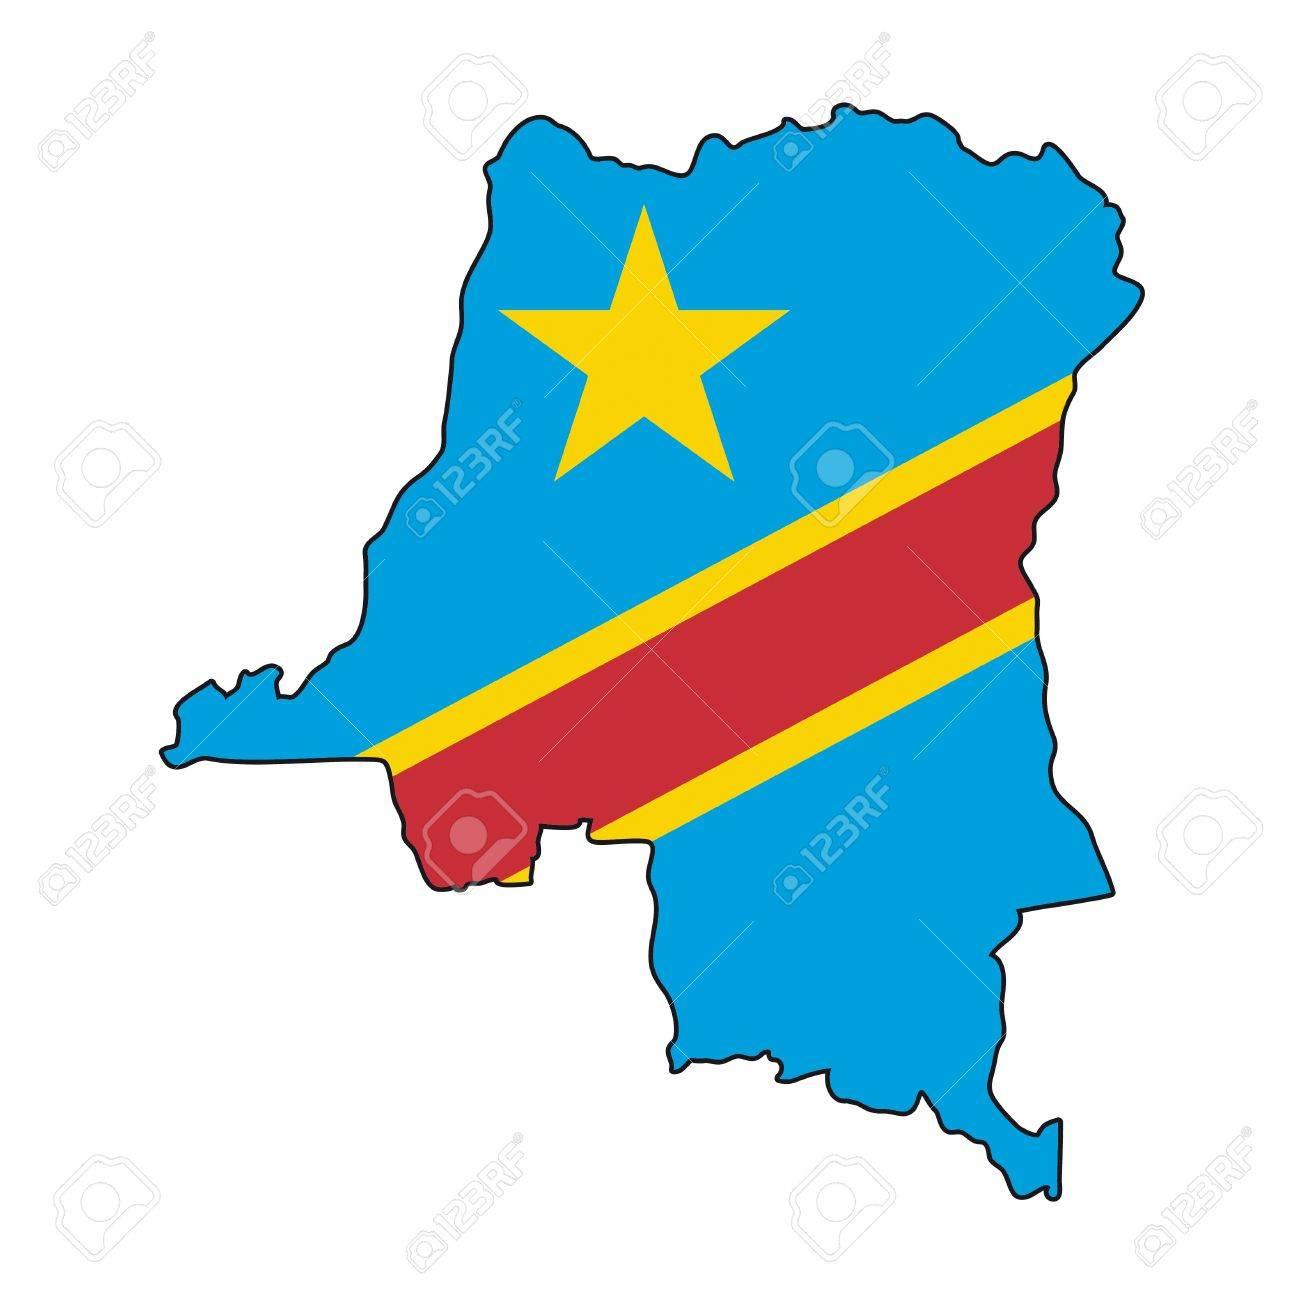 map flag Democratic Republic of the Congo Stock Vector - 10637997